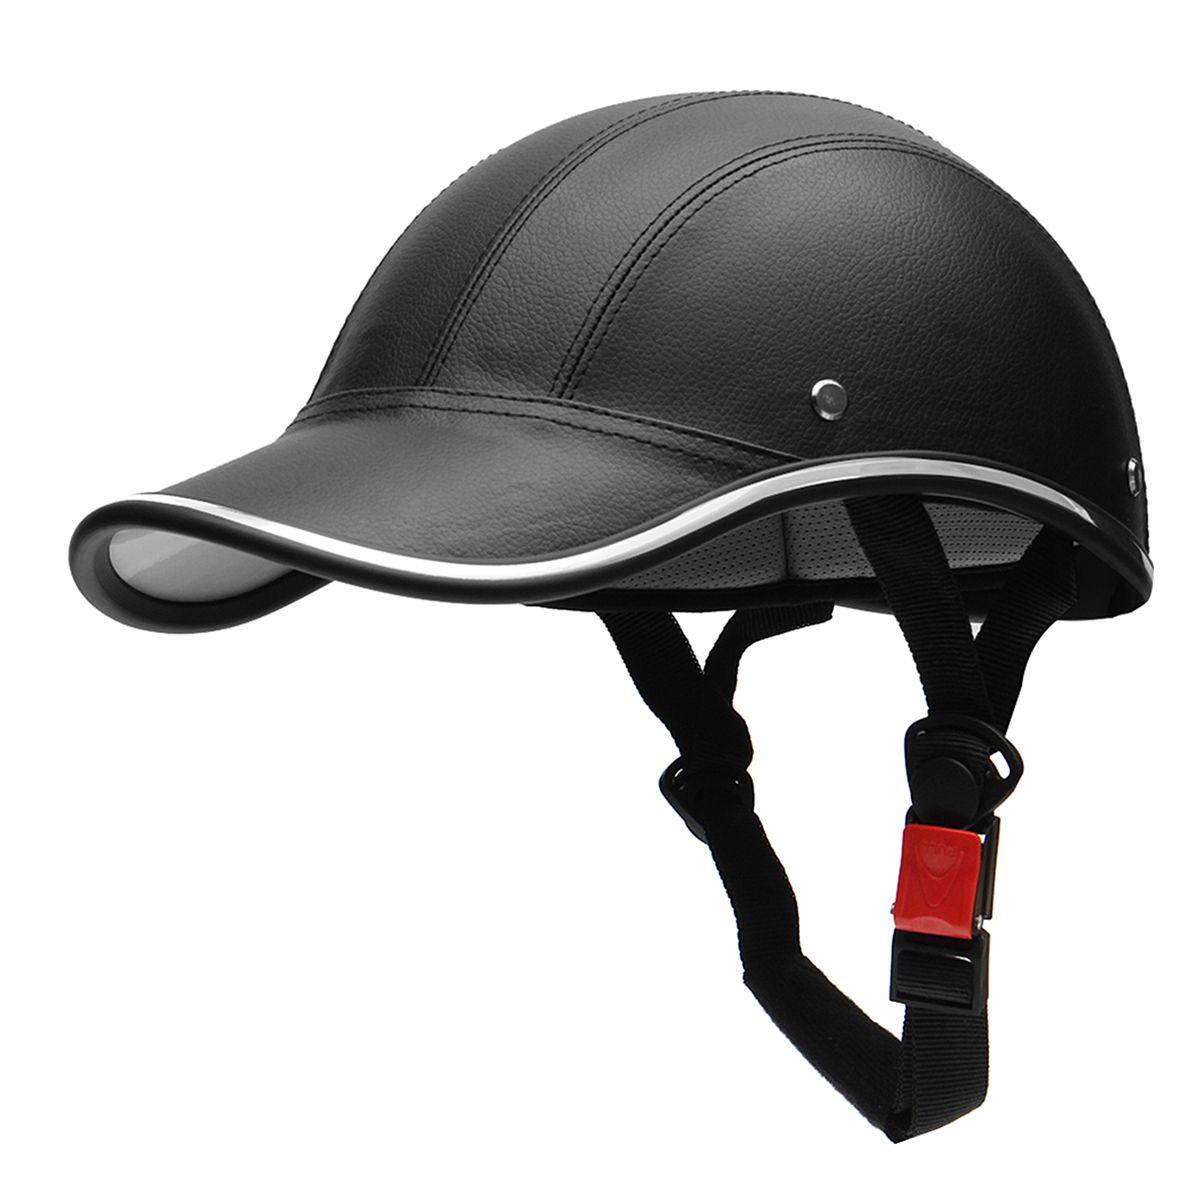 Motorcycle Half Helmet Baseball Cap StyleHalf Face Helmet Electric Bike Scooter Anti-UV Safety Hard Hat